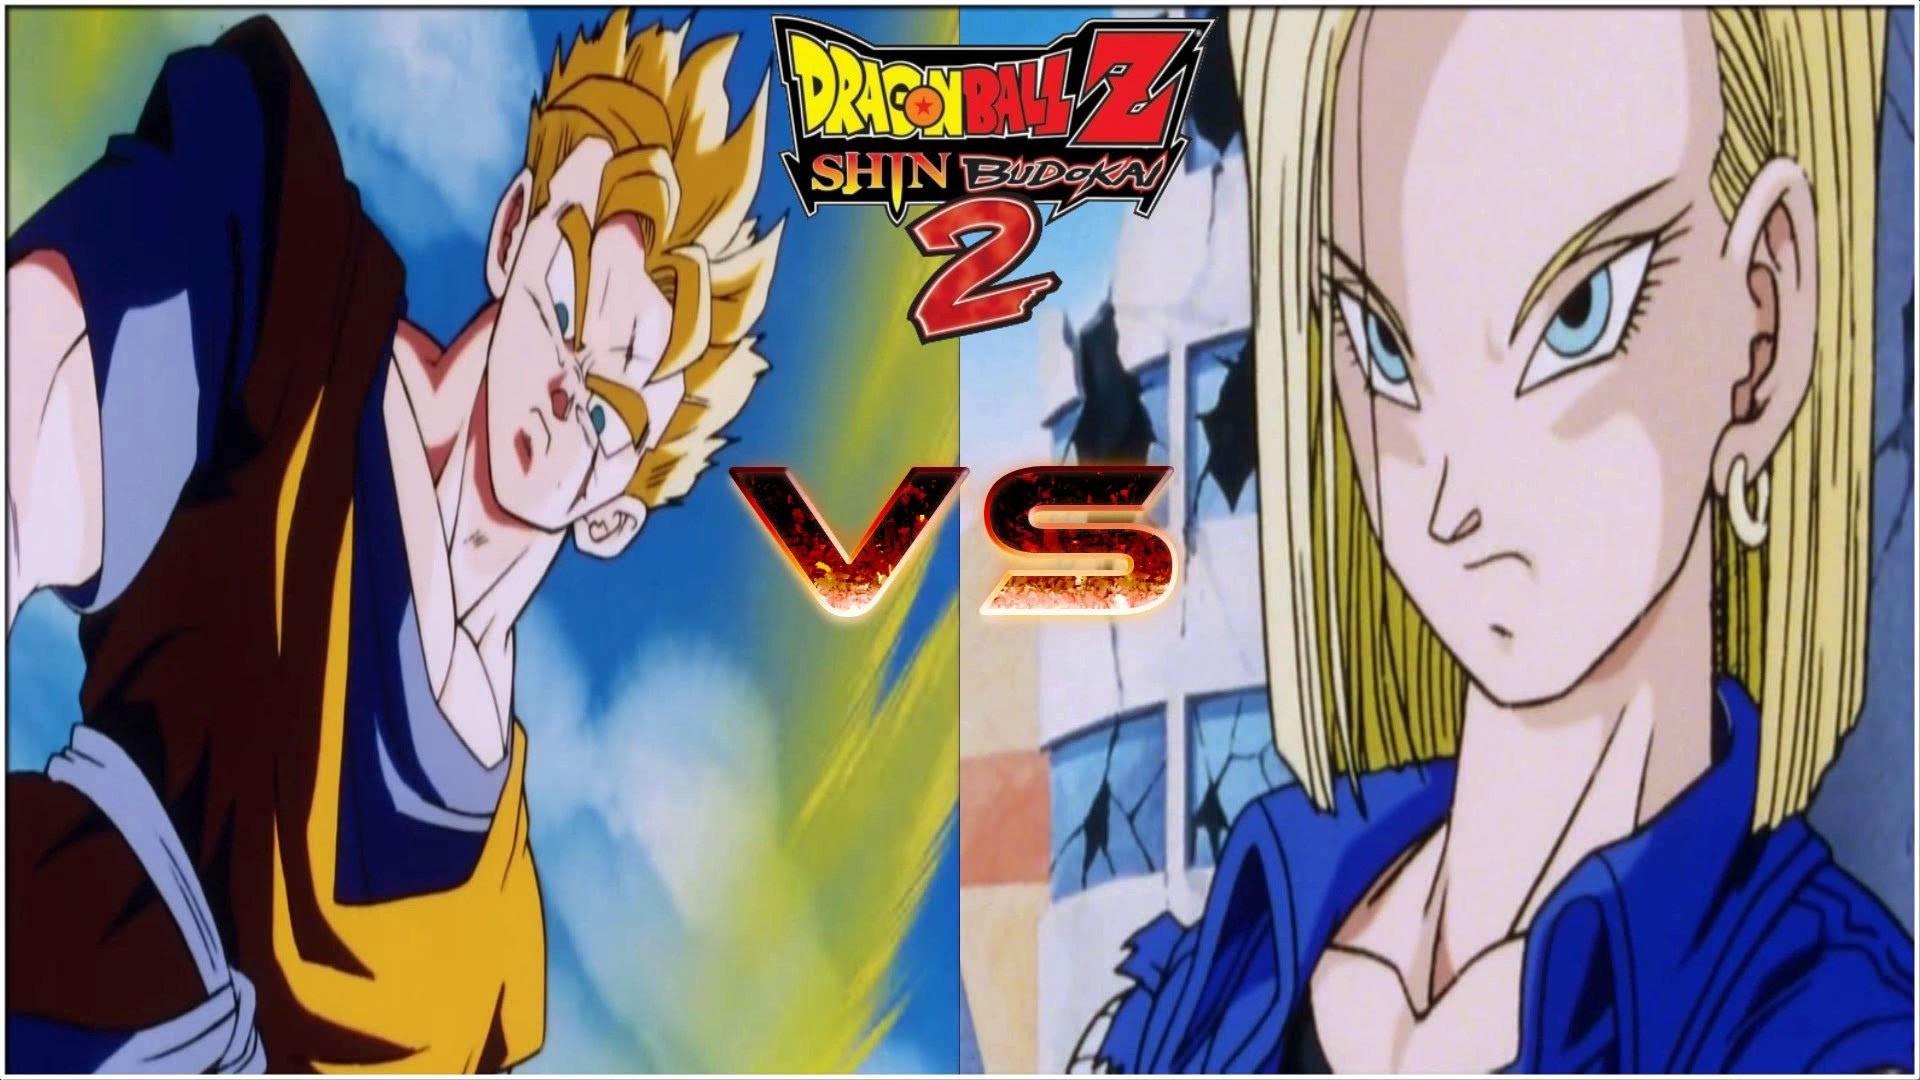 Dragon Ball Z Shin Budokai 2 | Super Saiyan Future Gohan vs Android 18 –  YouTube